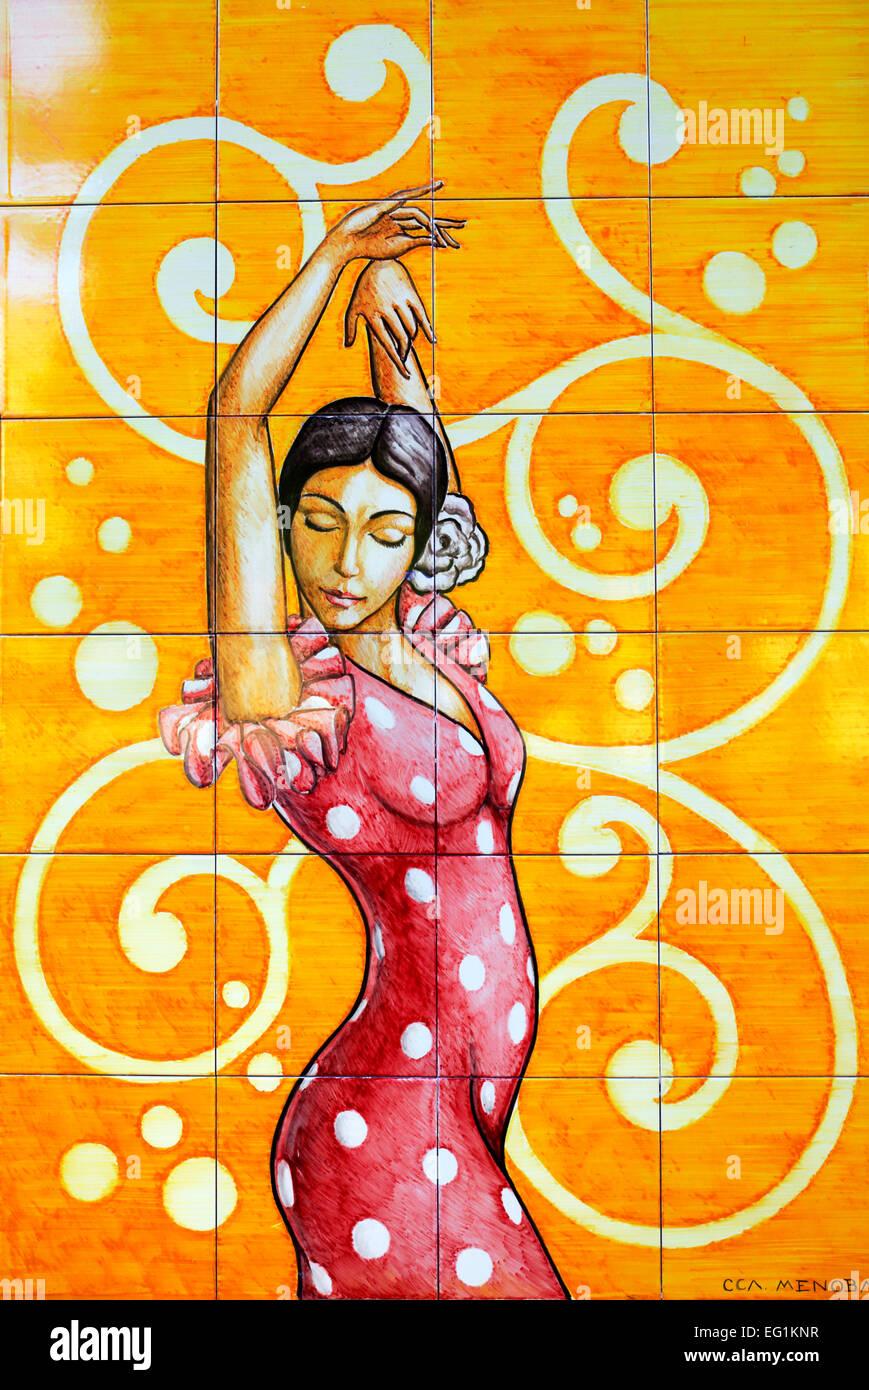 Flamenco dancer, azulejo, Seville, Andalusia, Spain - Stock Image